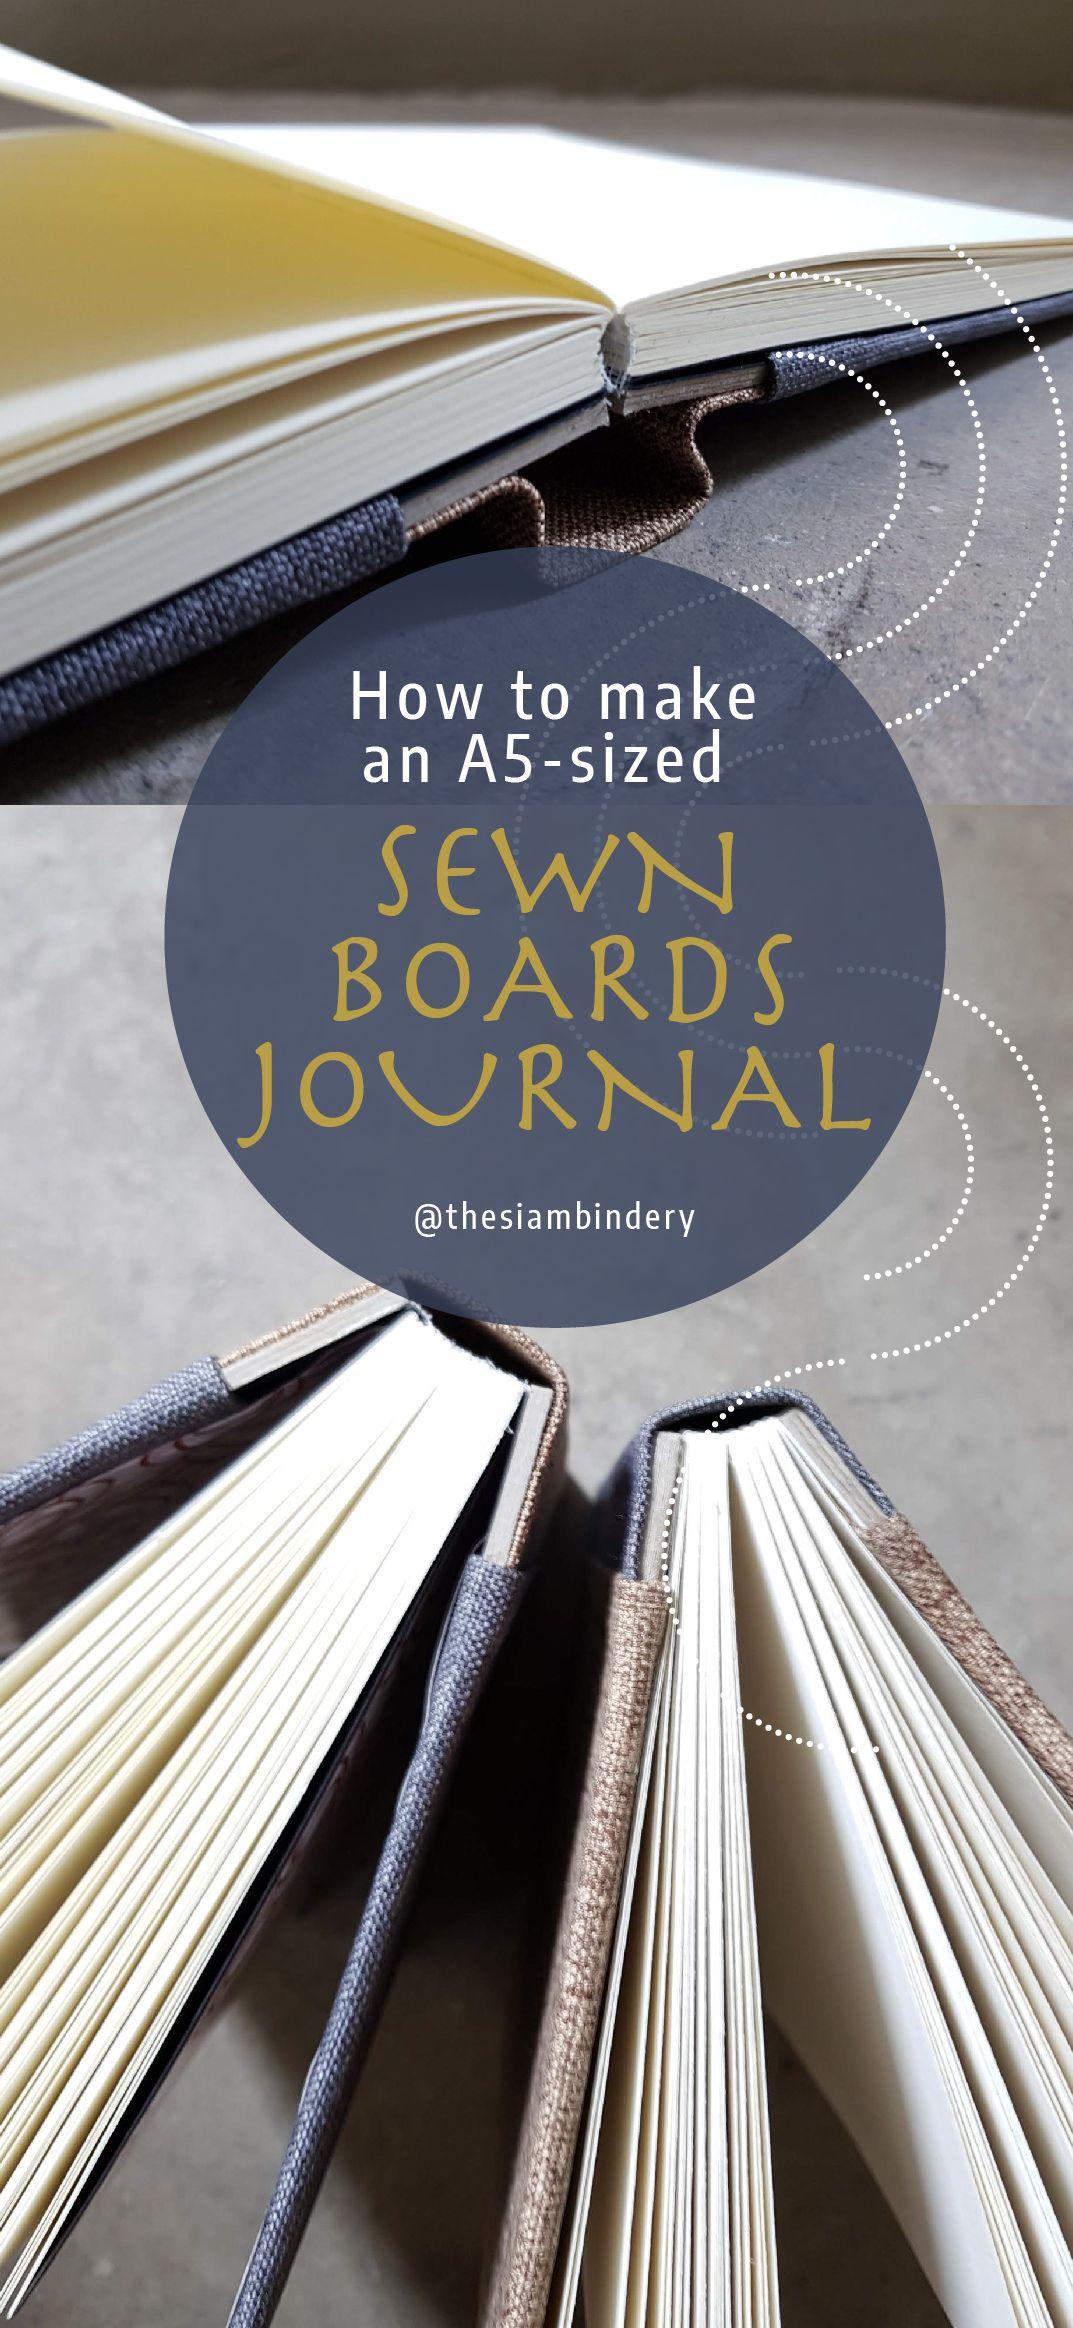 Sewn Boards Binding Tutorial Etsy in 2020 Book binding